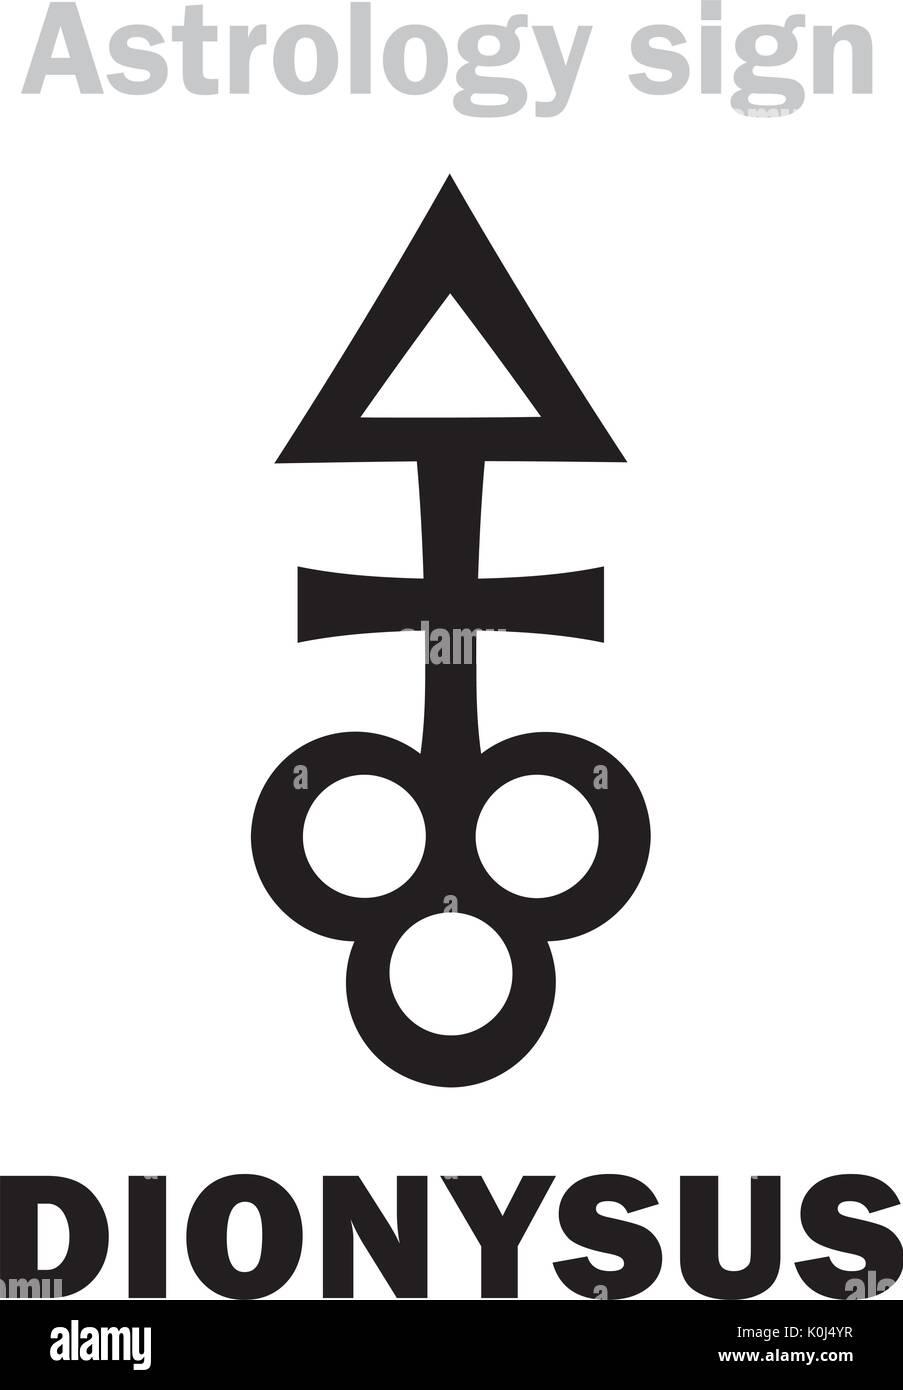 Astrology Alphabet Dionysus Asteroid 3671 Hieroglyphics